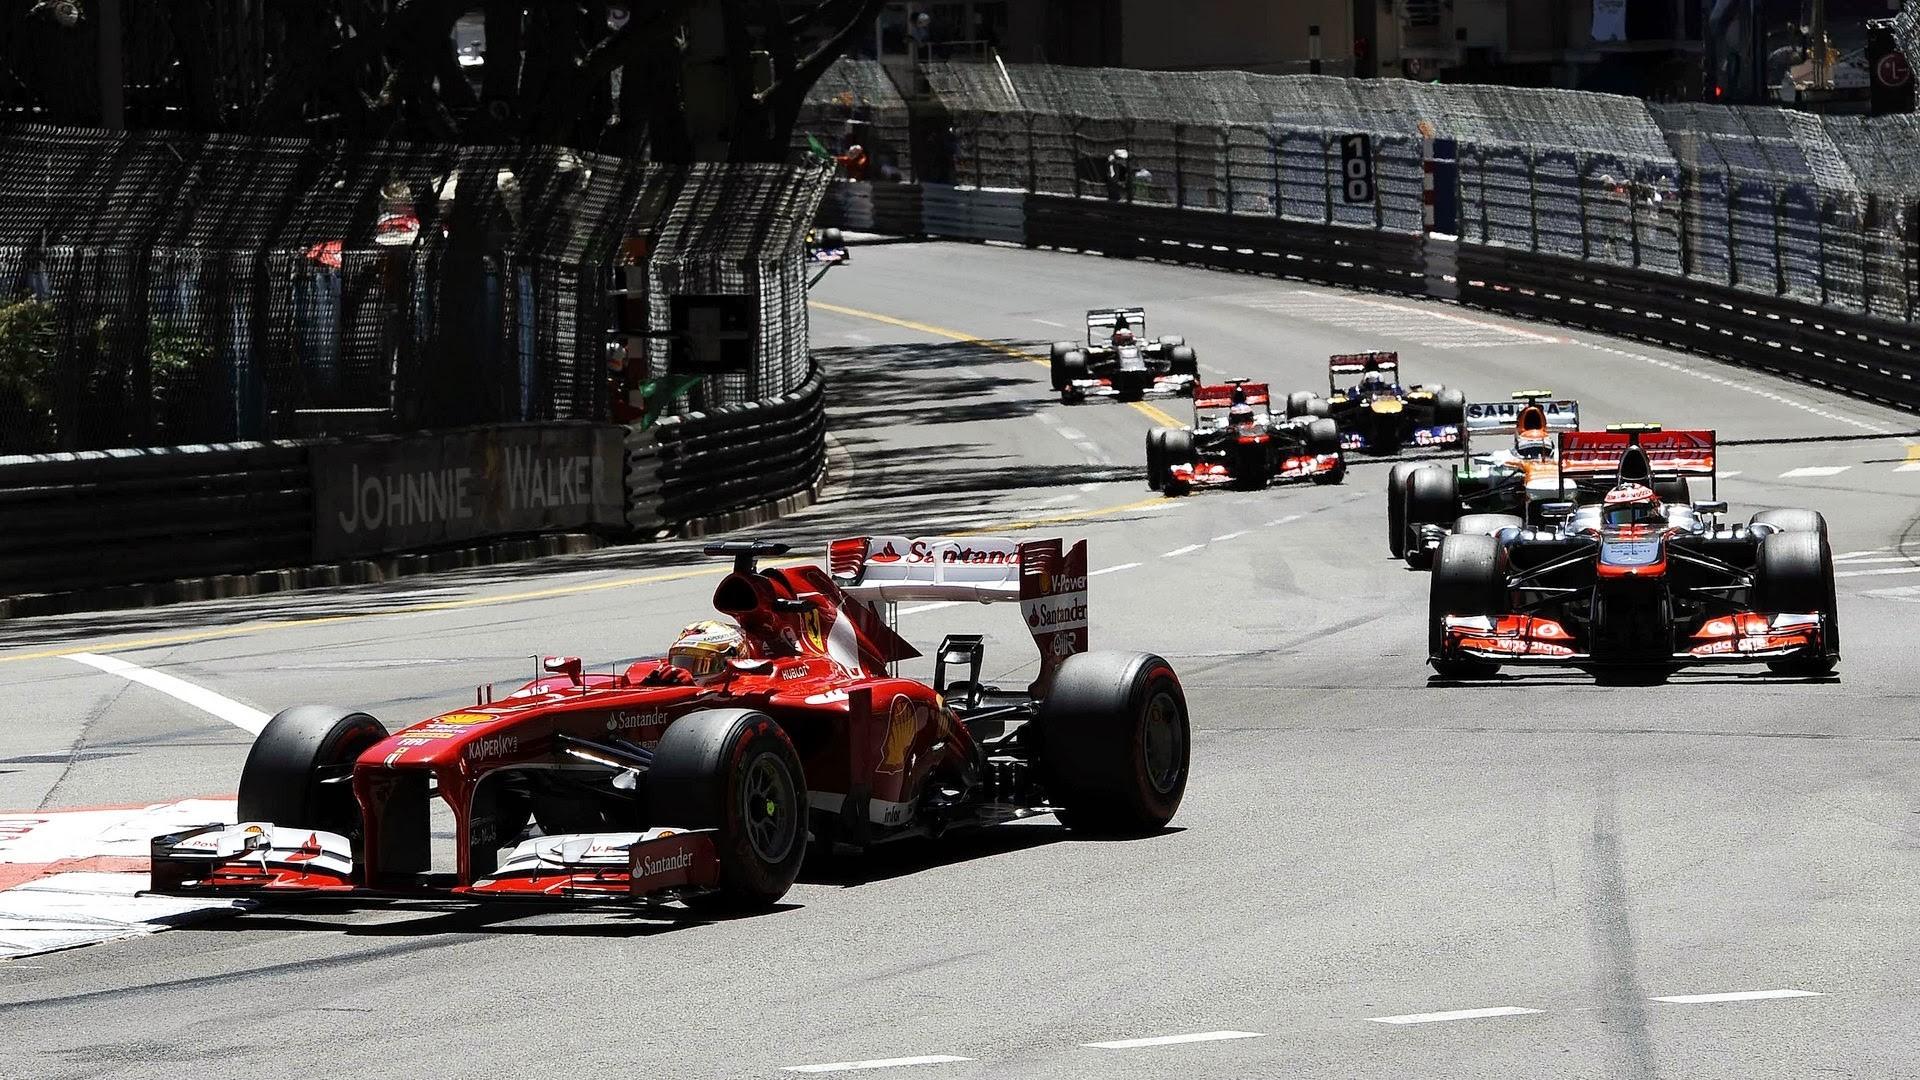 Formula 1 Wallpaper for pc